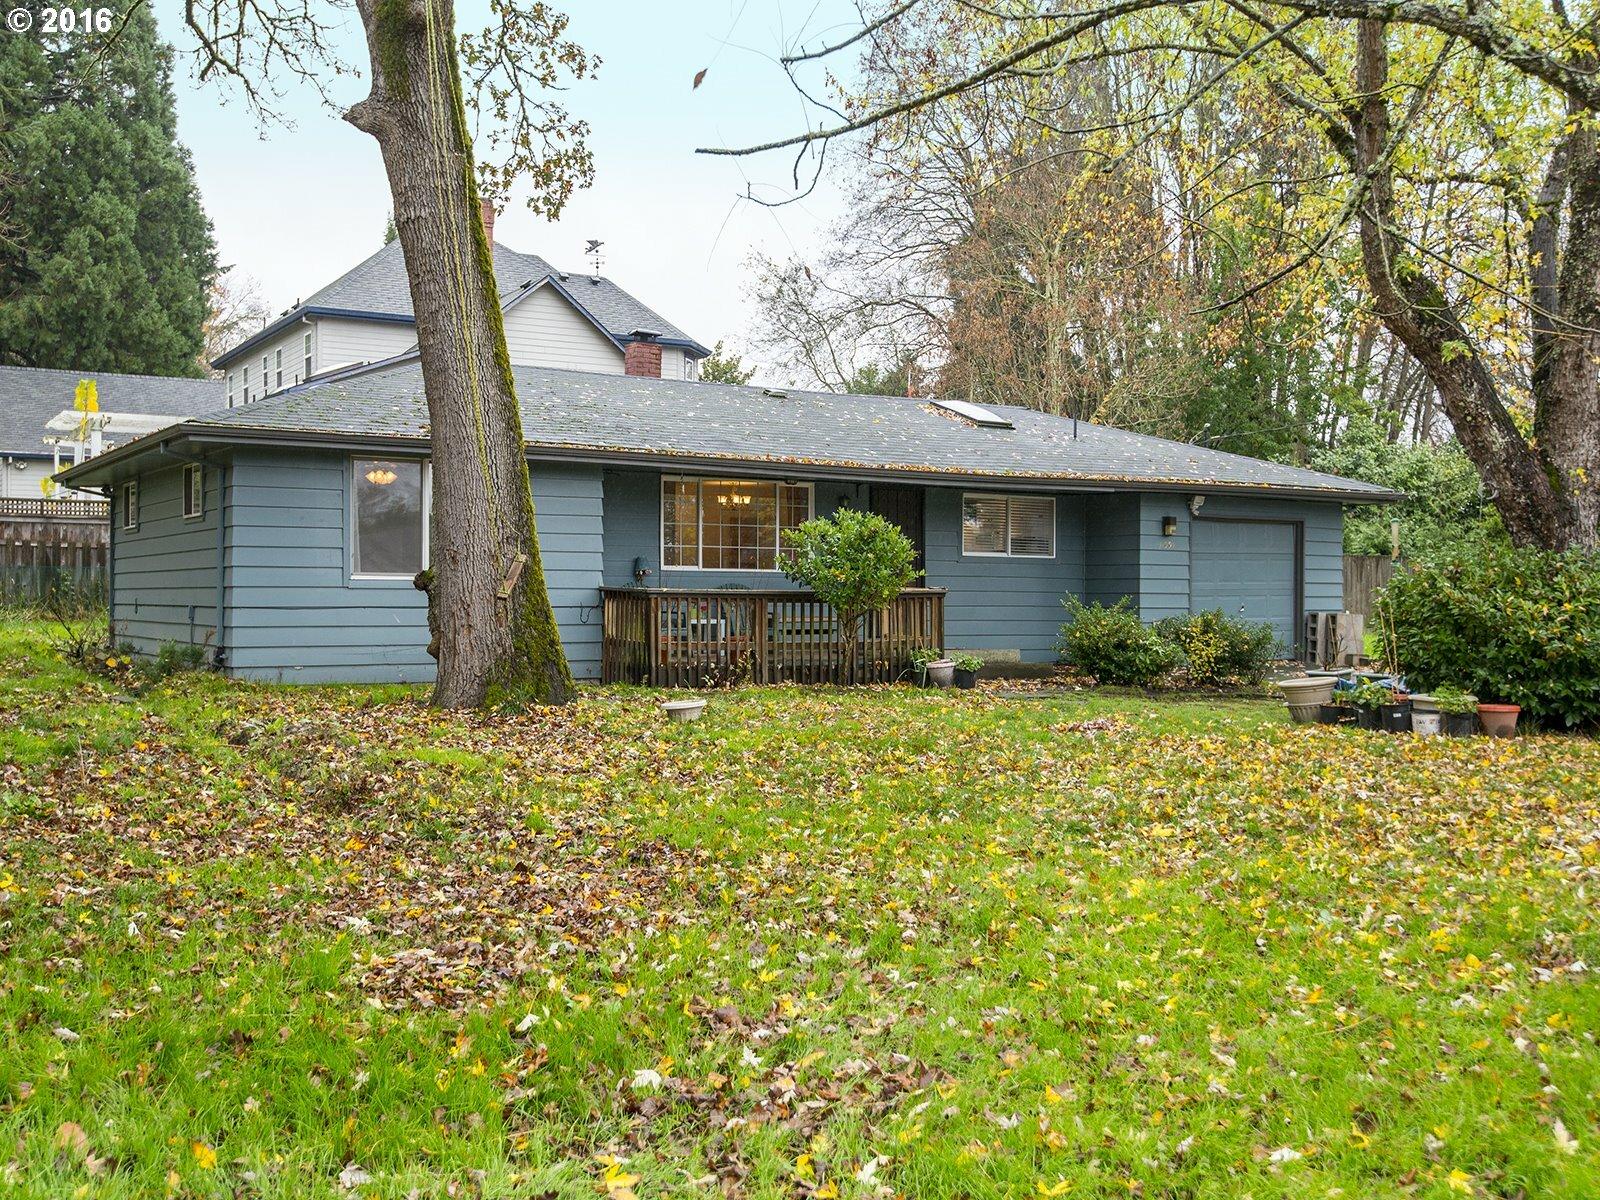 11997 Sw Walker Rd, Beaverton, OR - USA (photo 1)